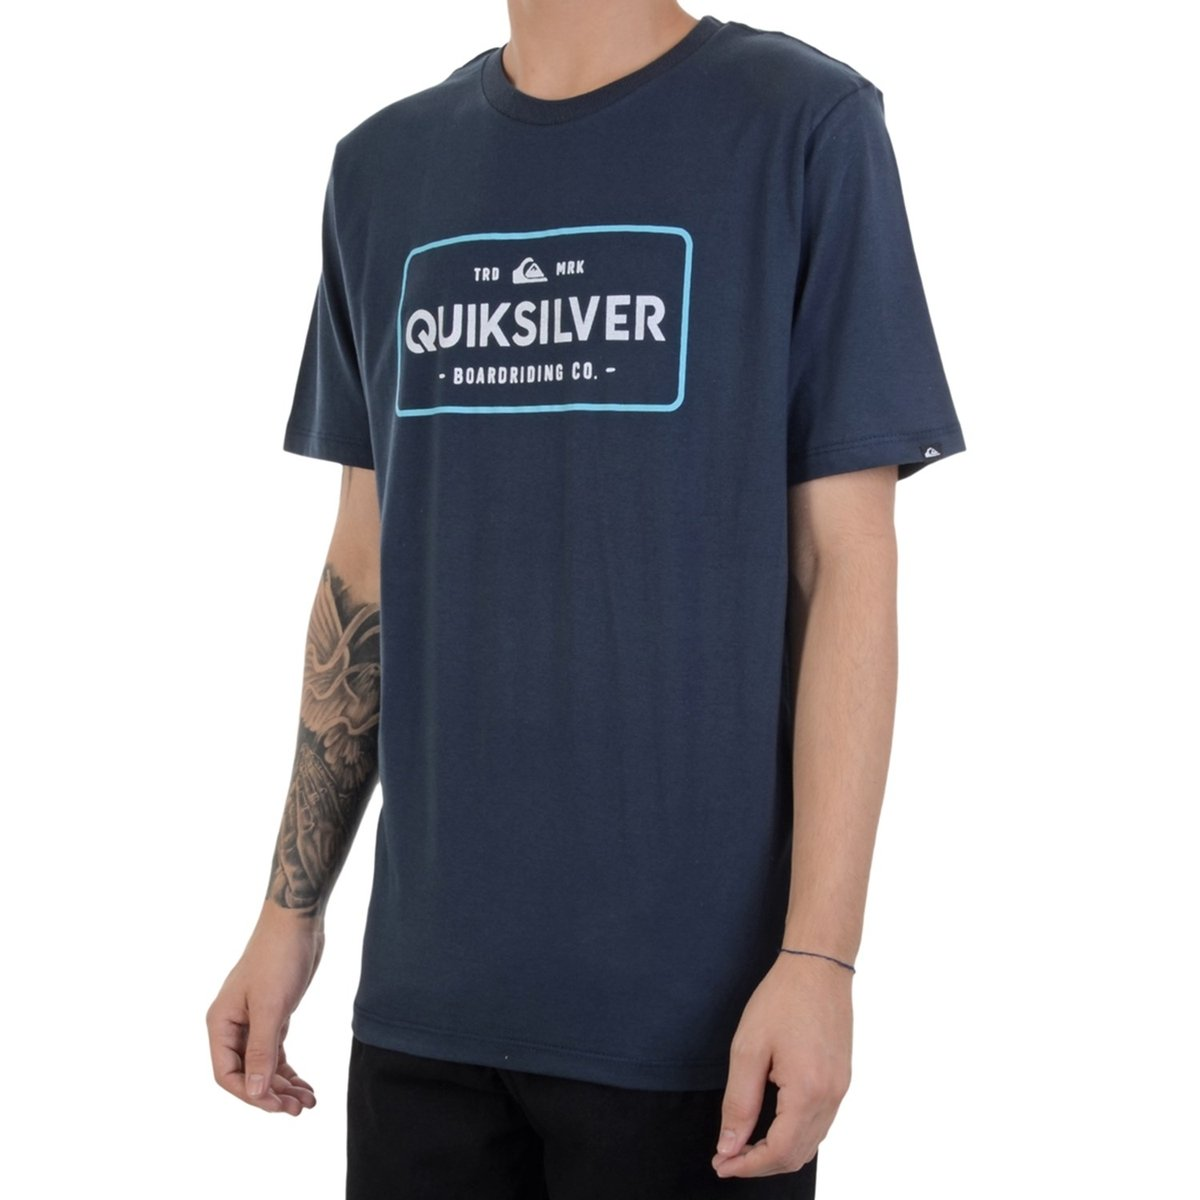 Camiseta Quiksilver Detention Thermal Masculina  Camiseta Quiksilver  Detention Thermal Masculina ... 5b13069995c